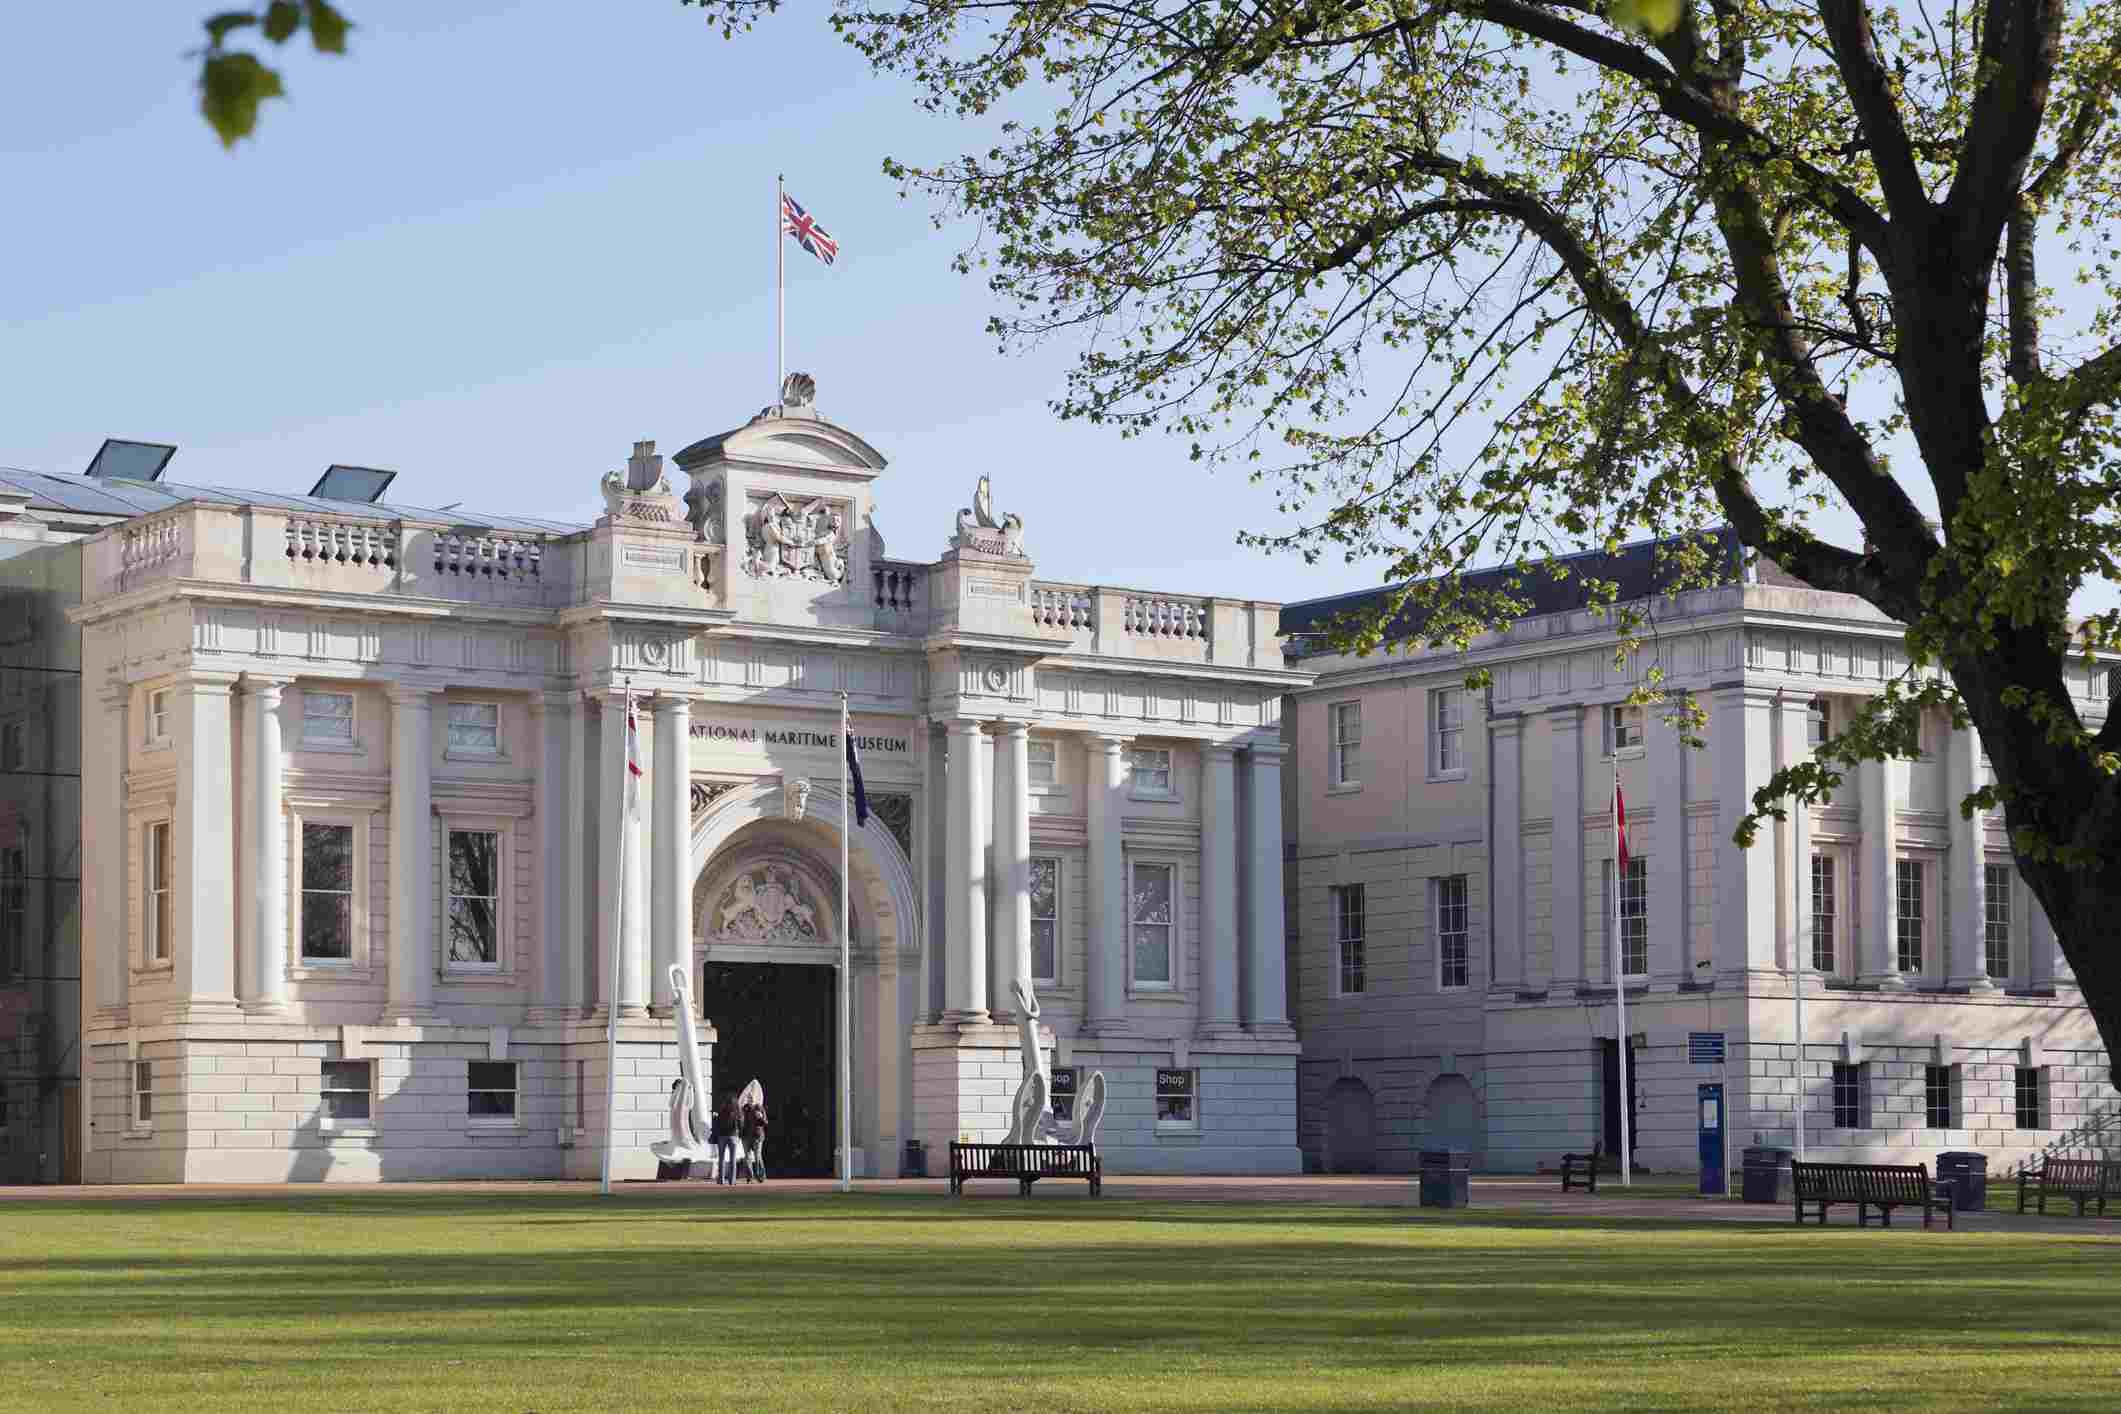 National Maritime Museum in Greenwich, London